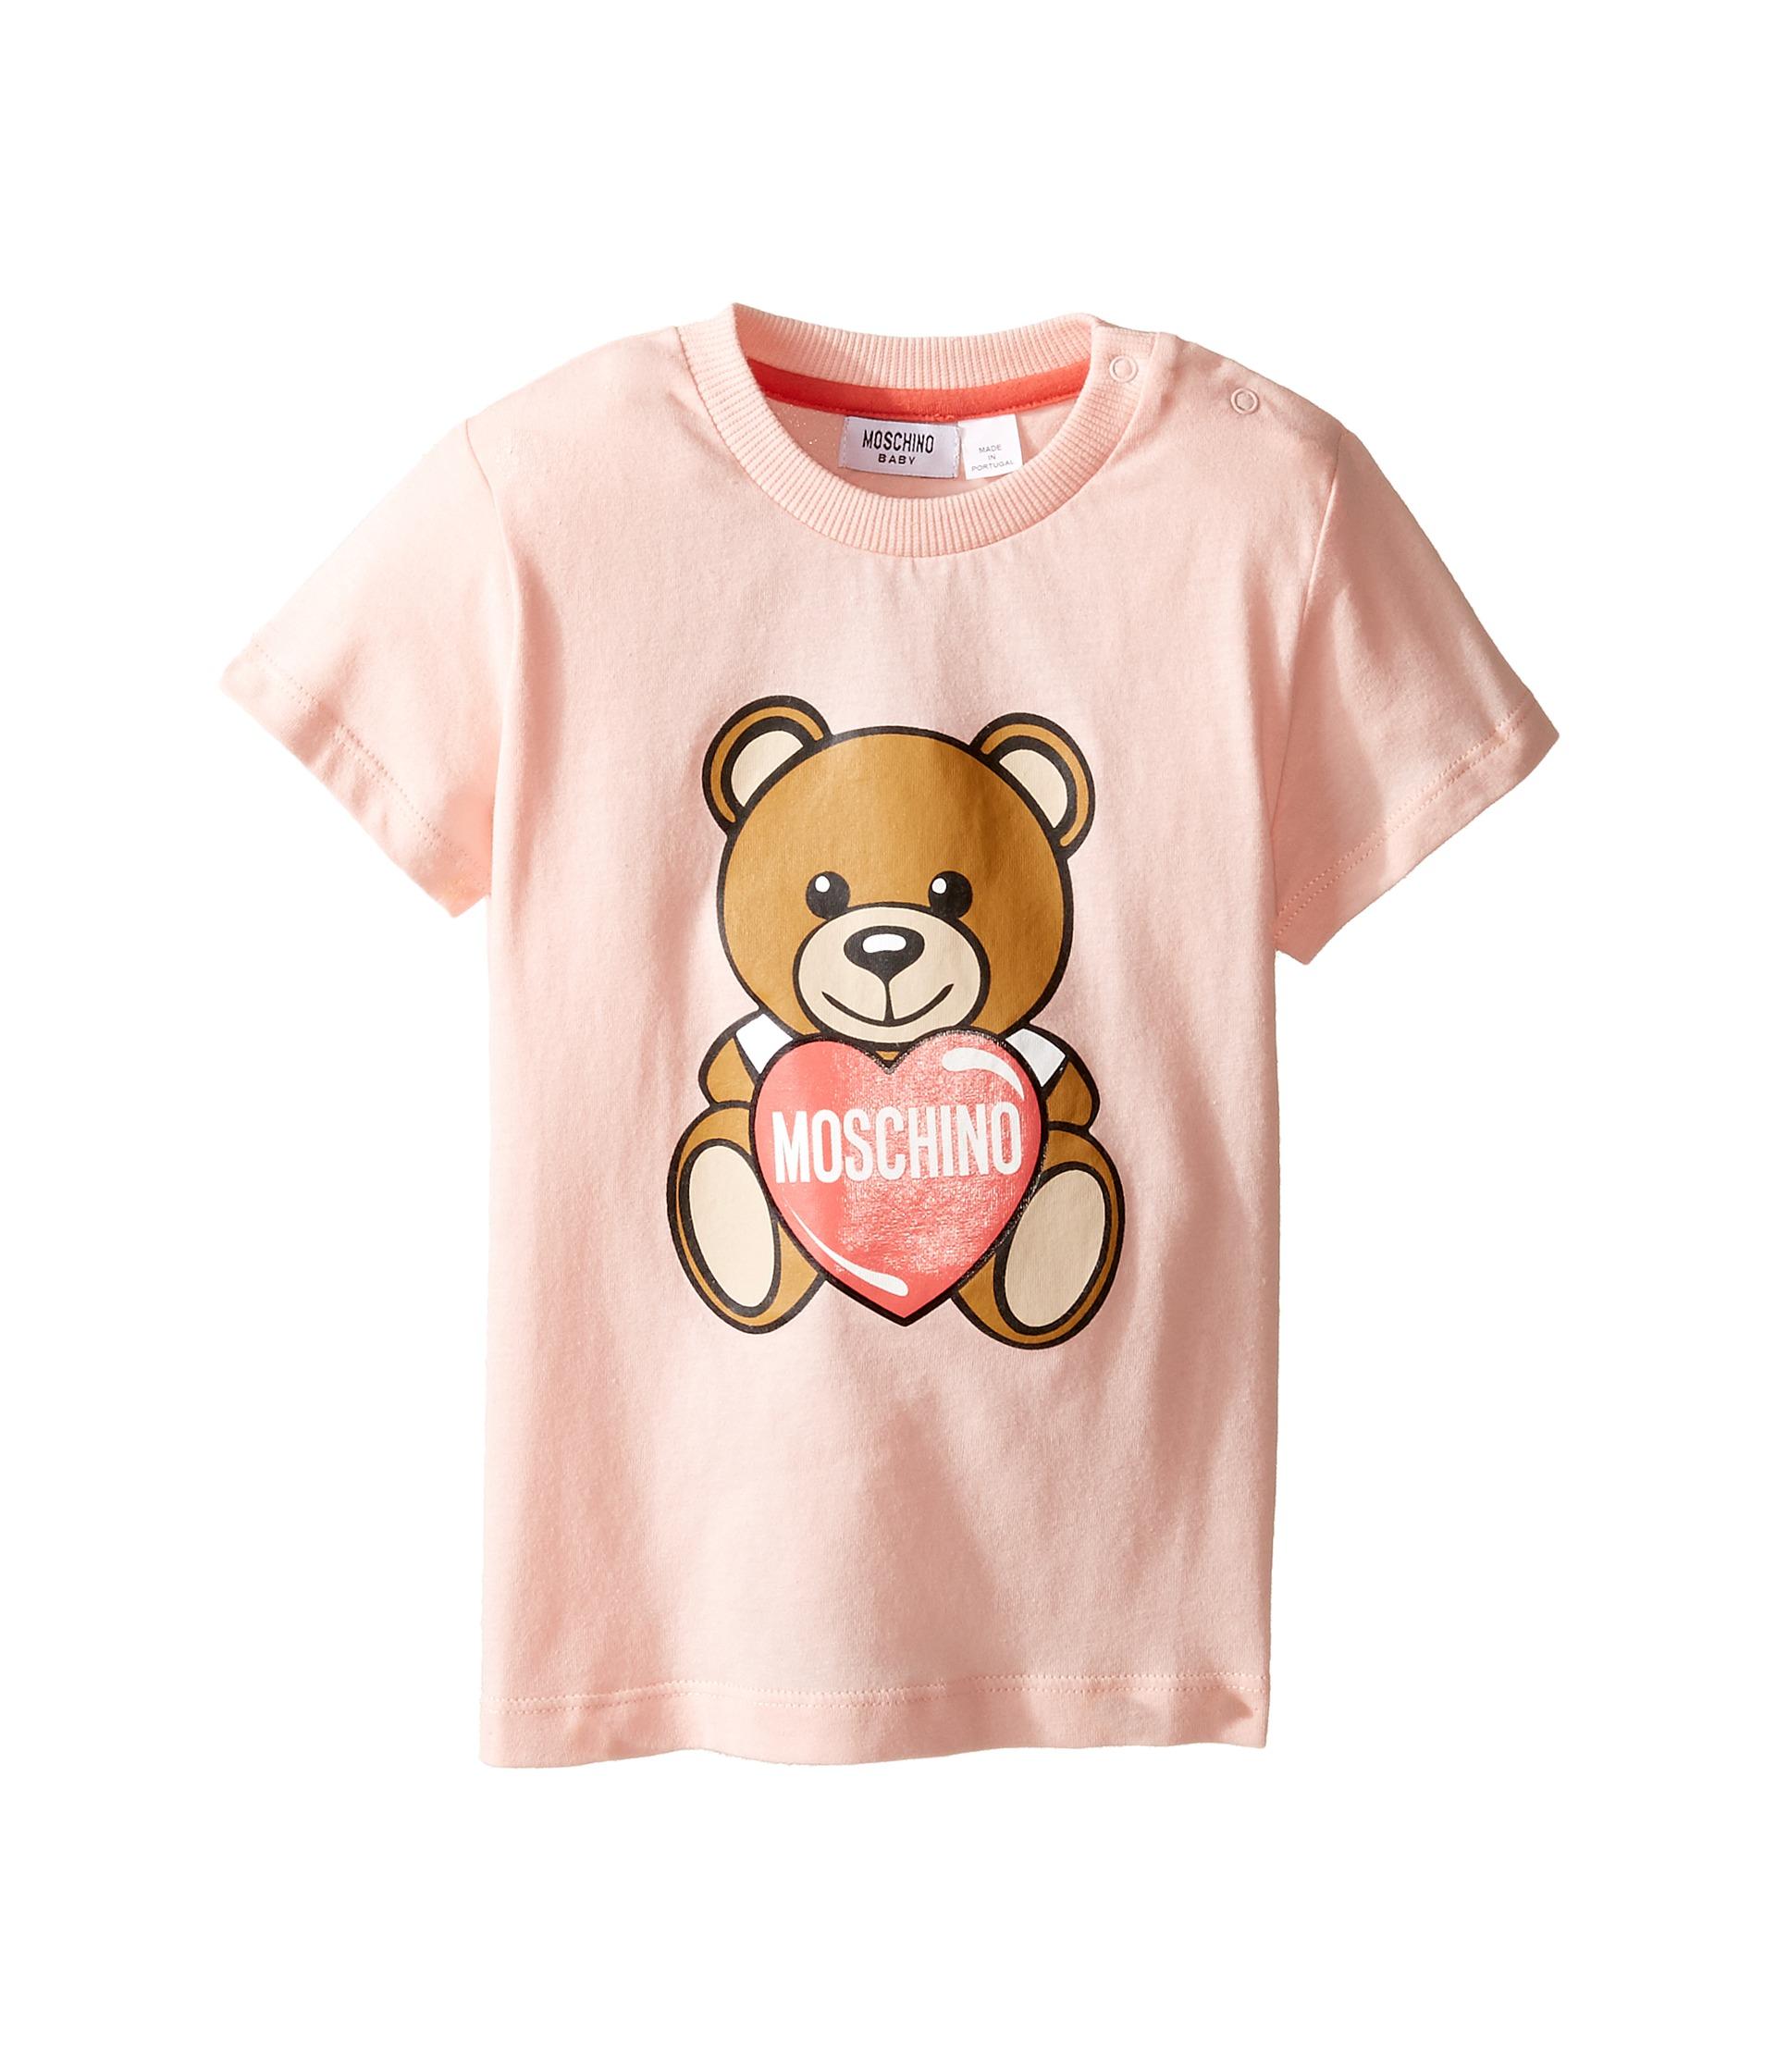 cfc7ec19e Moschino Kids Teddy Bear and Heart Graphic Short Sleeve T-Shirt ...